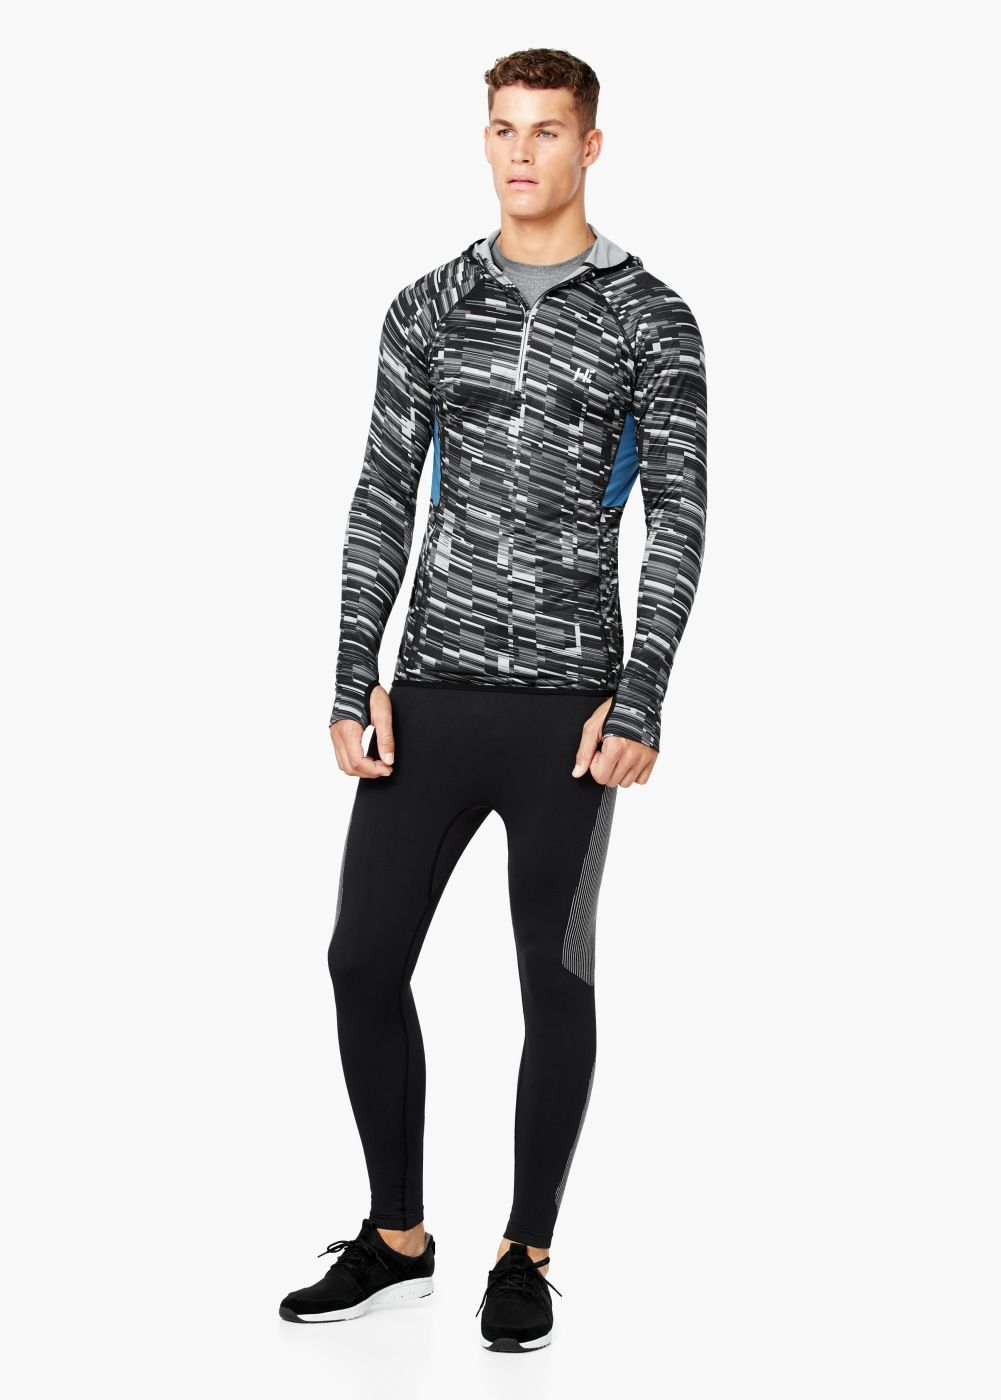 53cbd3626 Mallas largas running - Mujer | sport wil's | Ropa para correr, Ropa ...